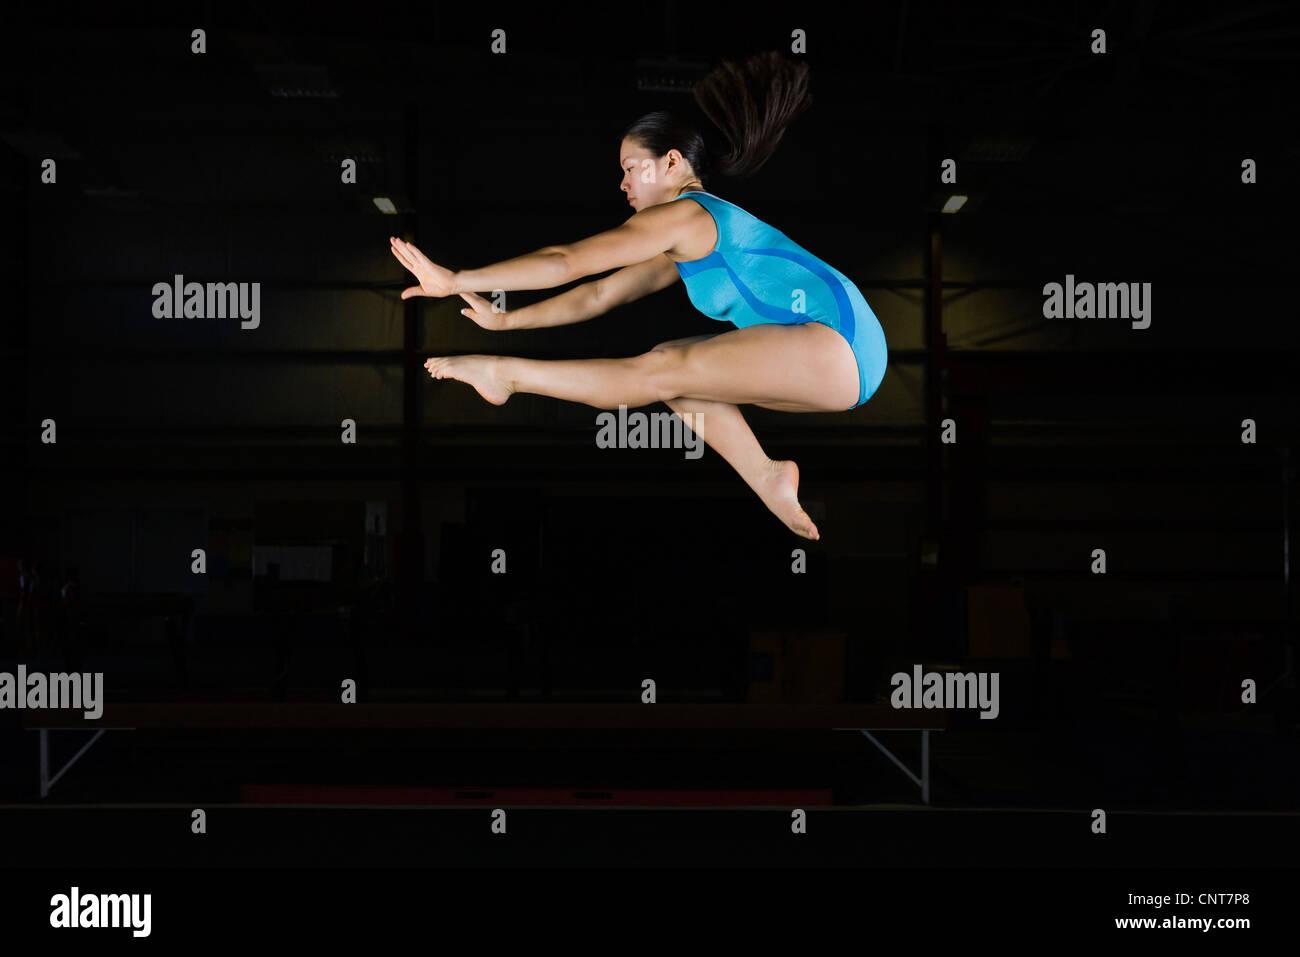 Teenage girl gymnast jumping on balance beam - Stock Image